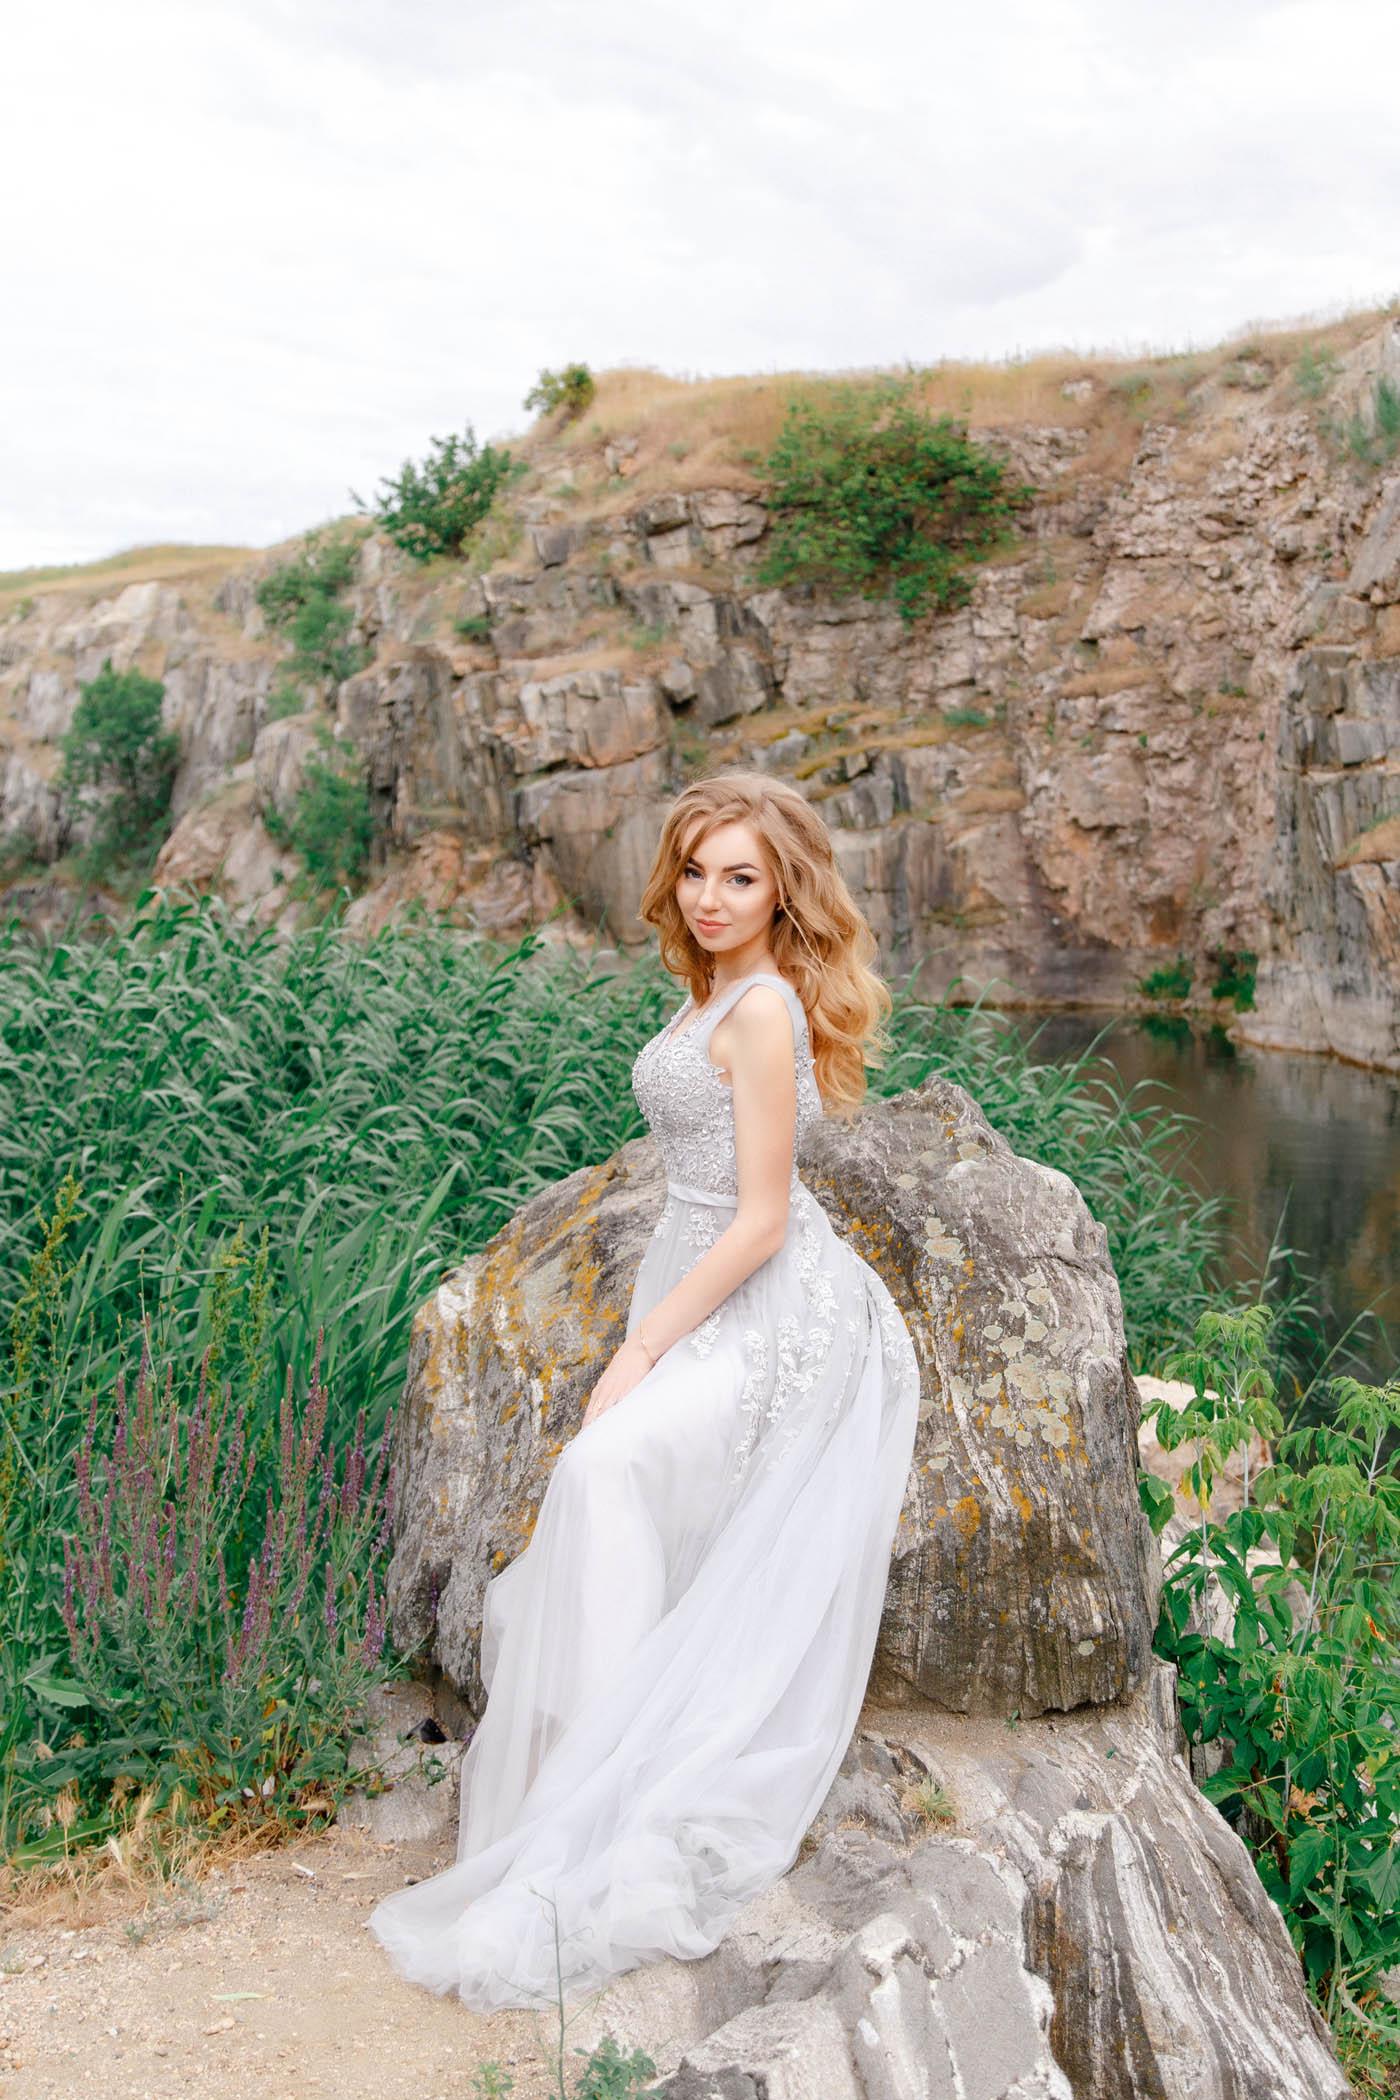 Marina, Ukraine bride for marriage